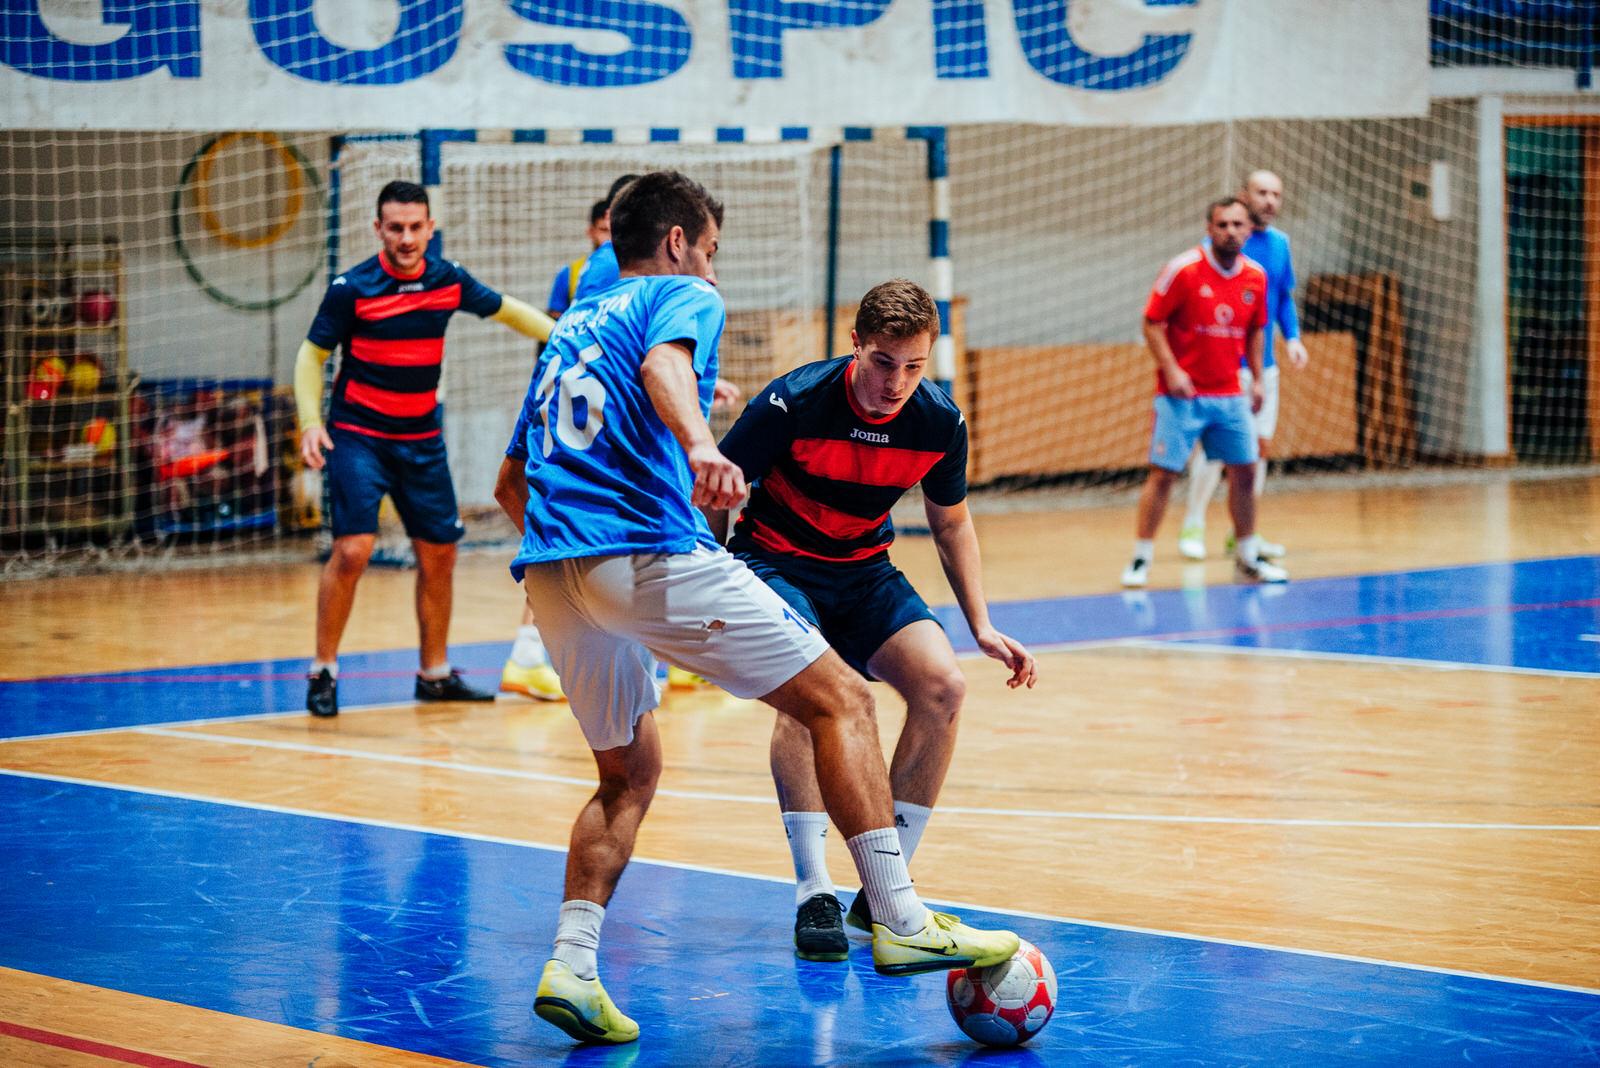 likaclub_zimska-malonogometna-liga-gospić_2019-20-81